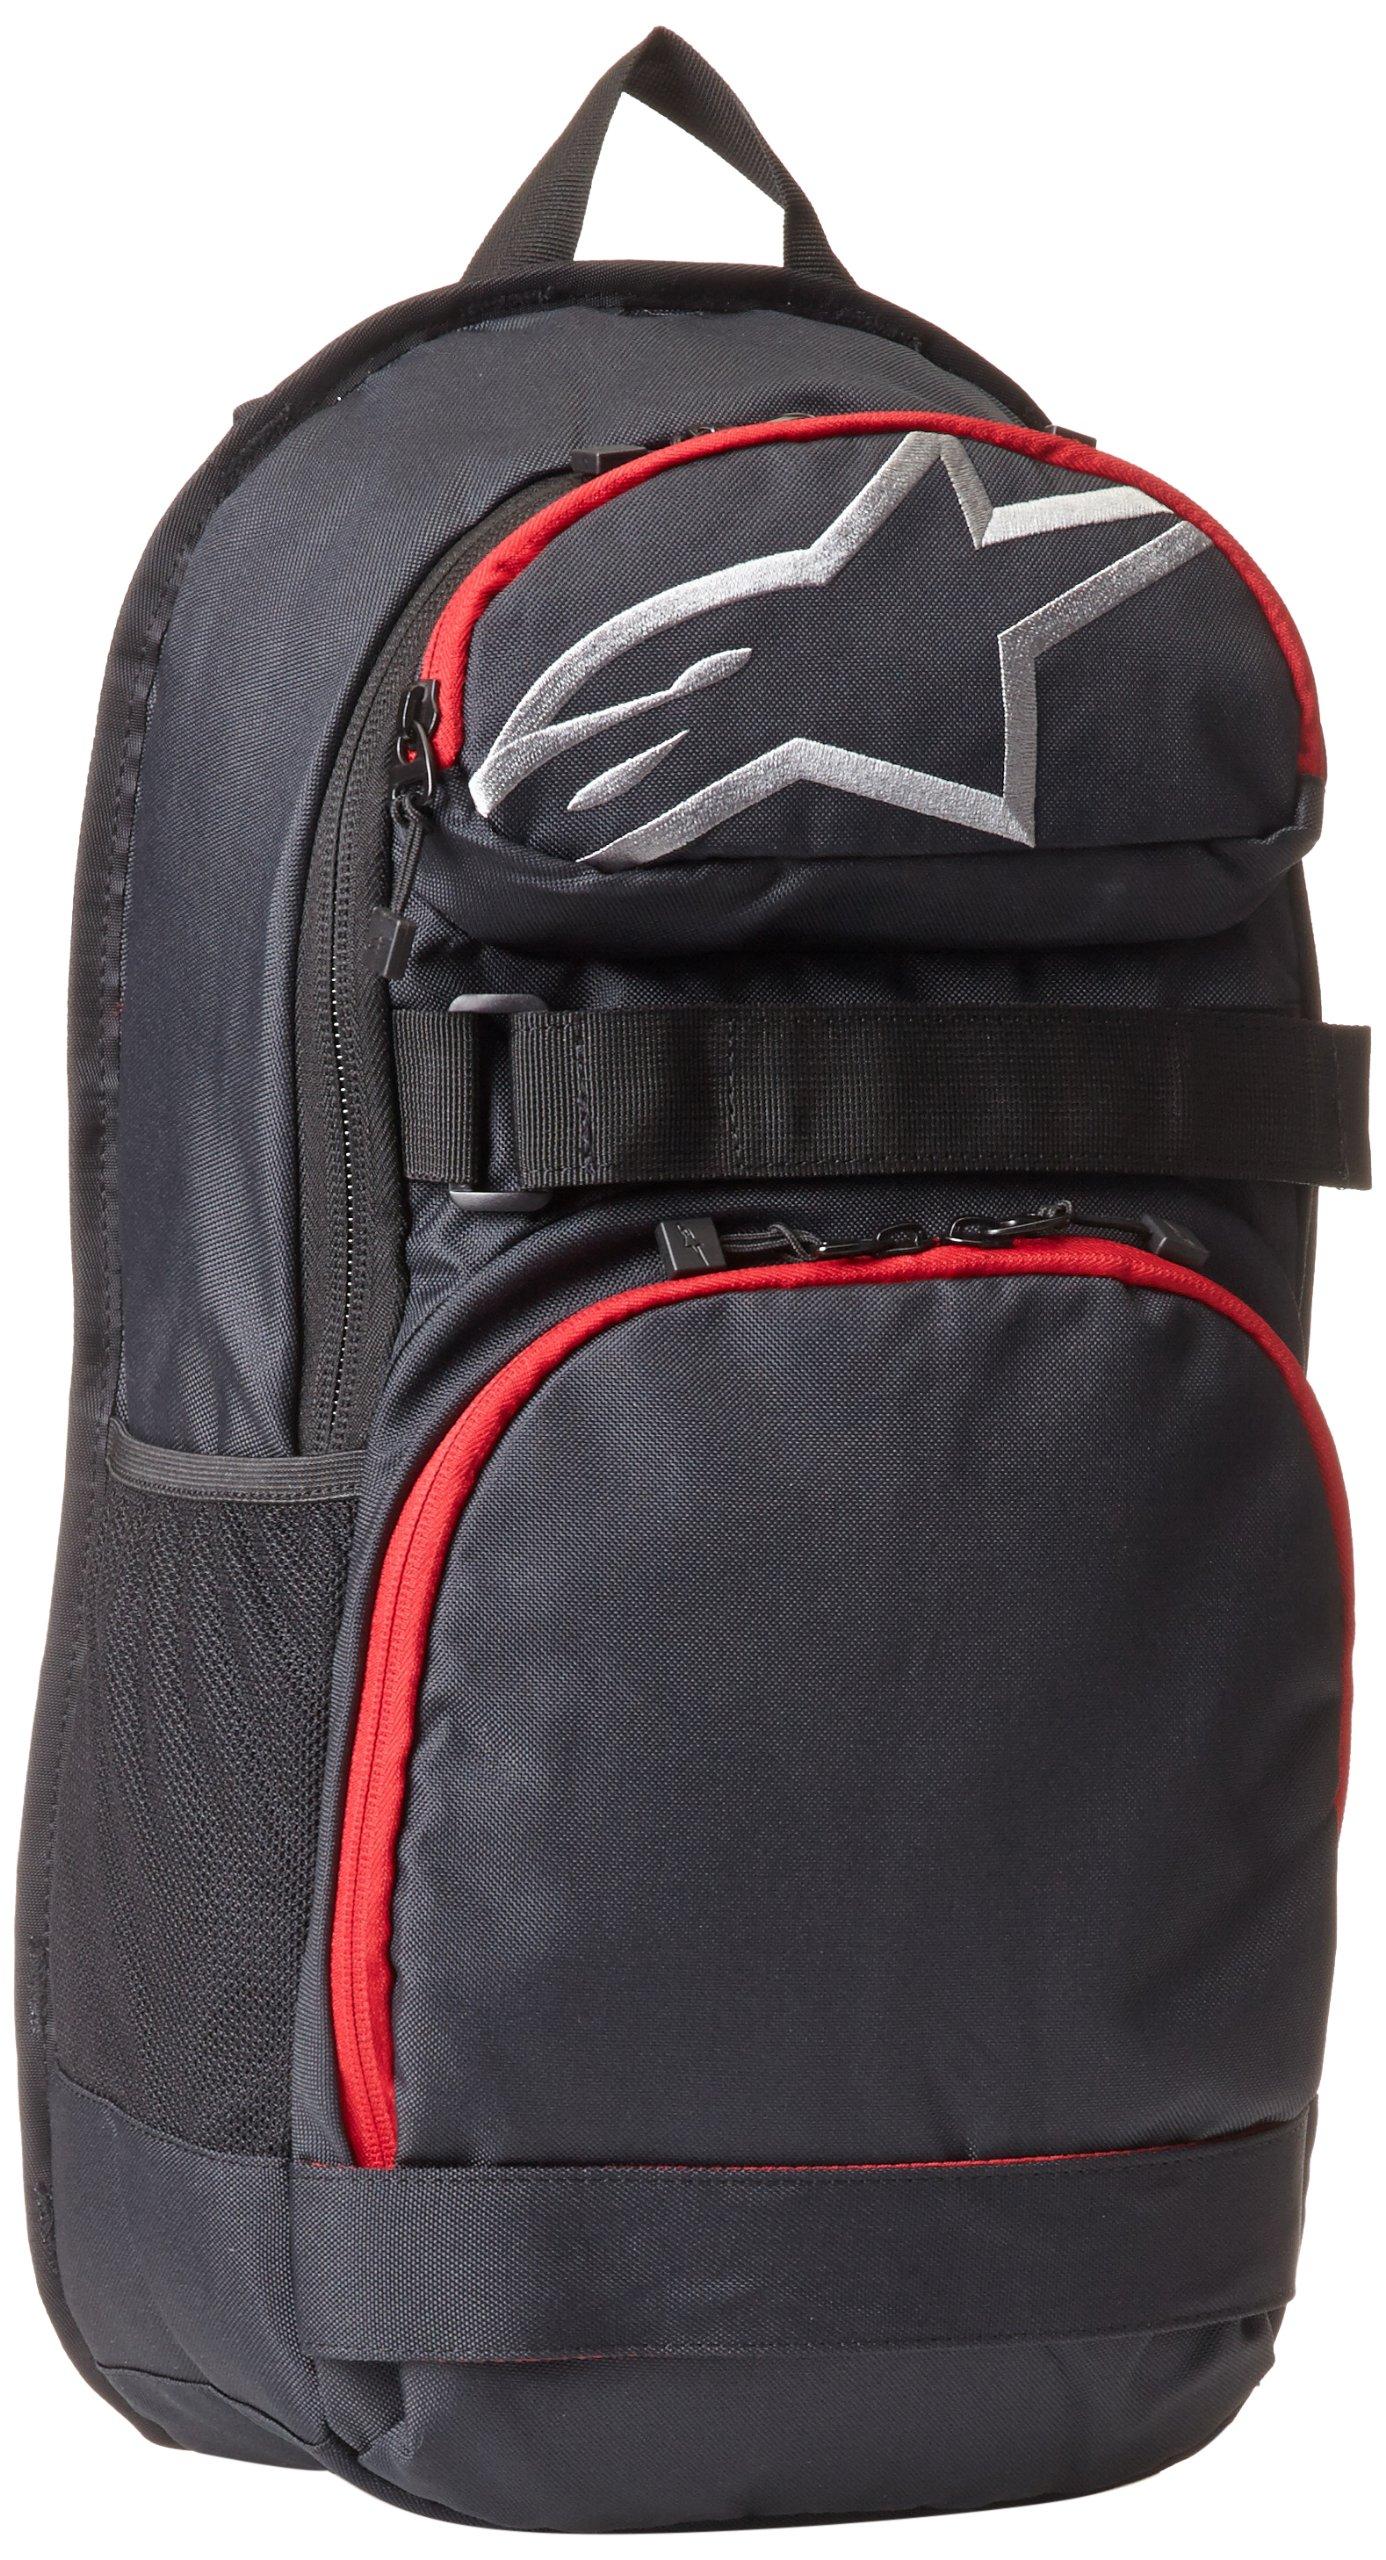 ALPINESTARS Men's Optimus Pack Hat, Black/Red, One Size